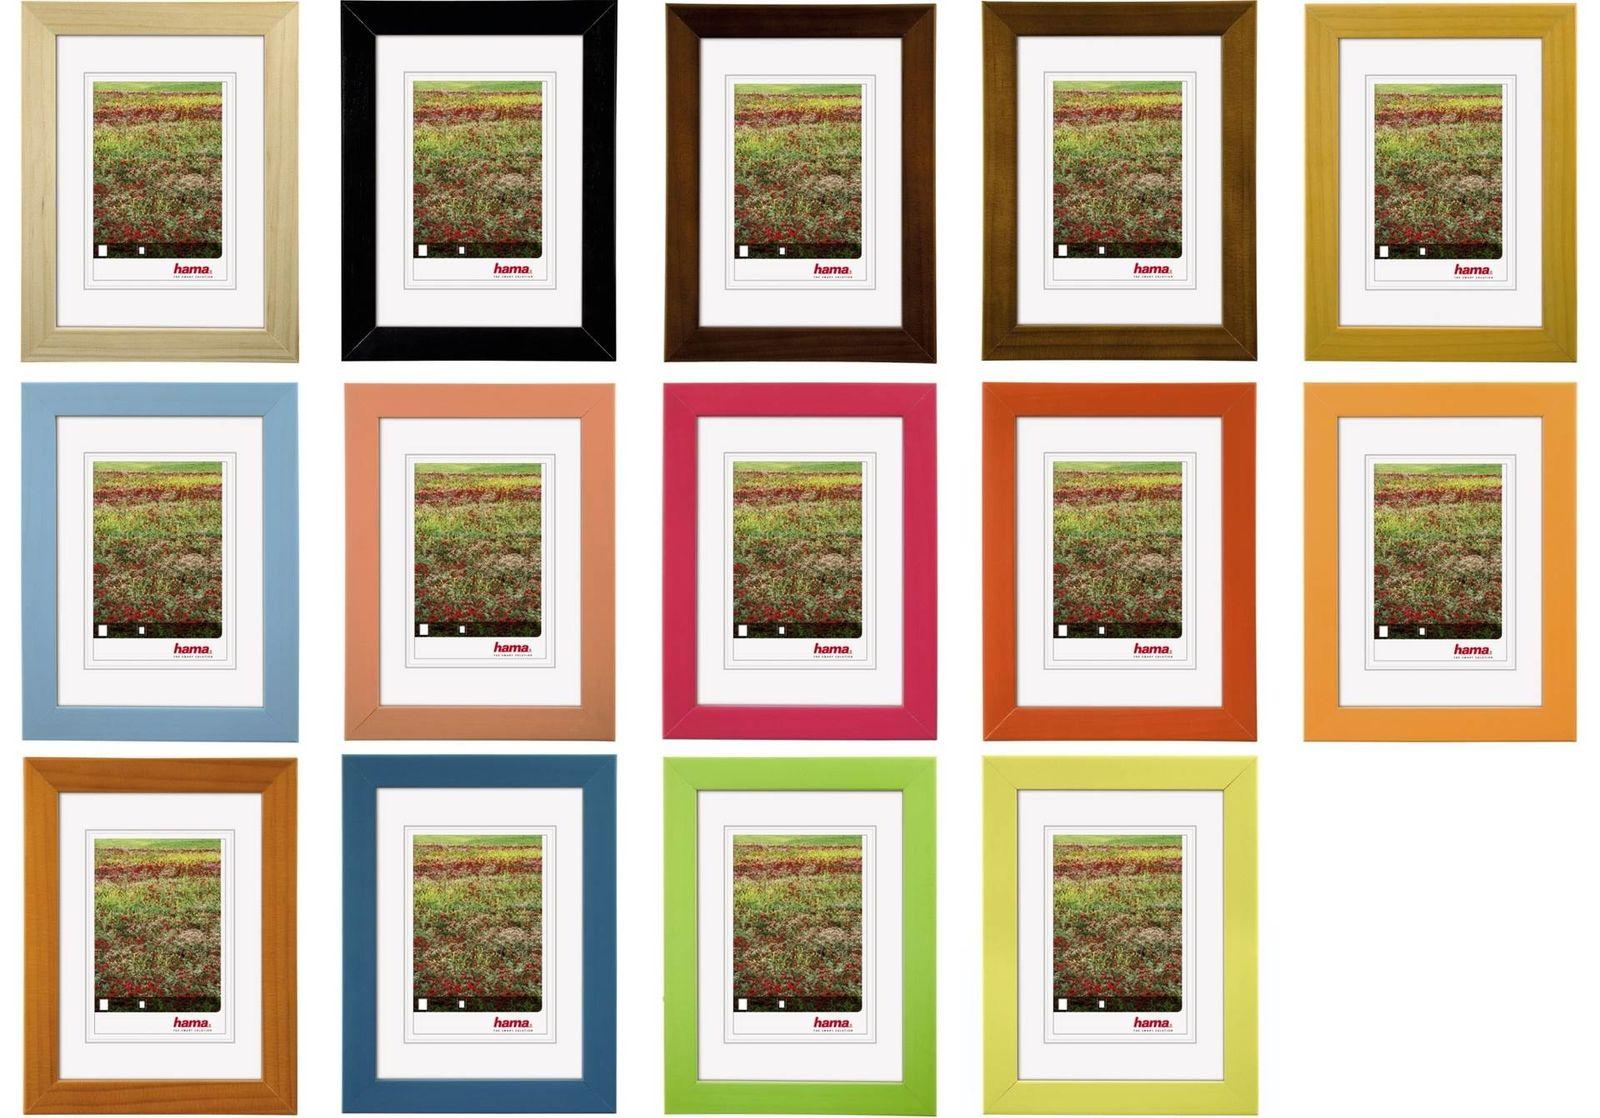 Hama Holz Rahmen Foggia Bilder-Rahmen Poster Fotos Portrait Wand ...